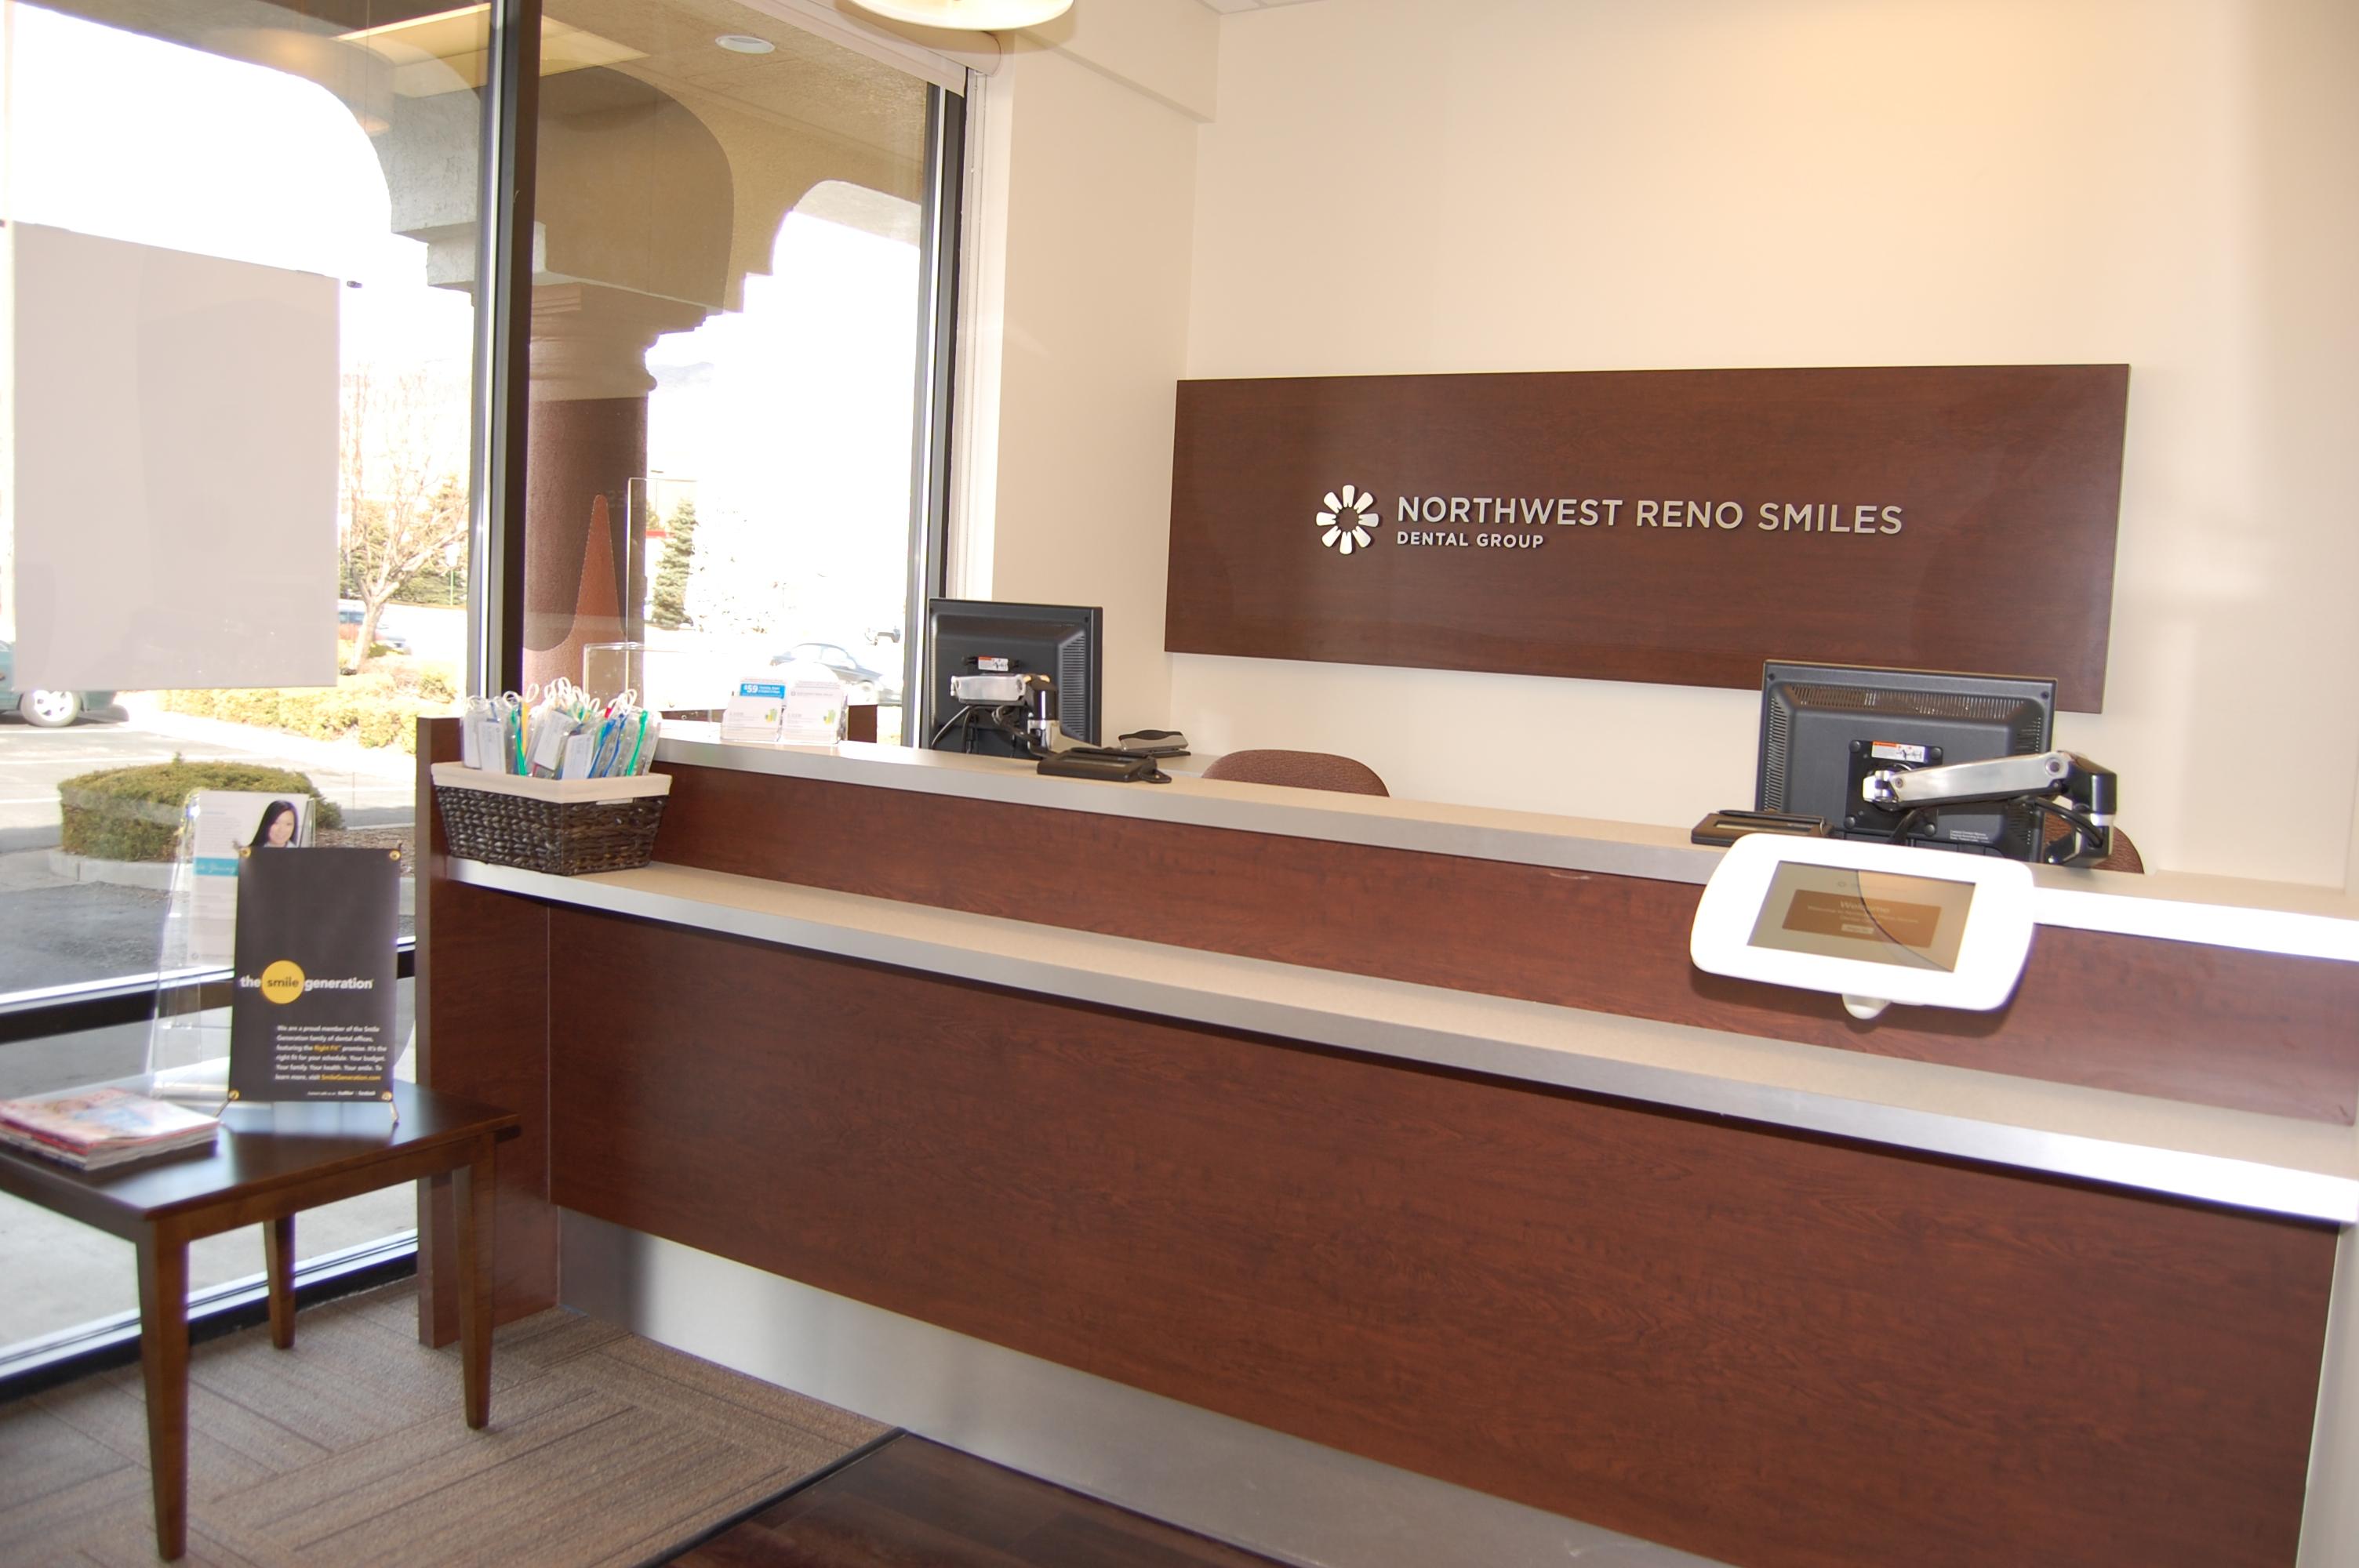 Northwest Reno Smiles Dental Group image 3